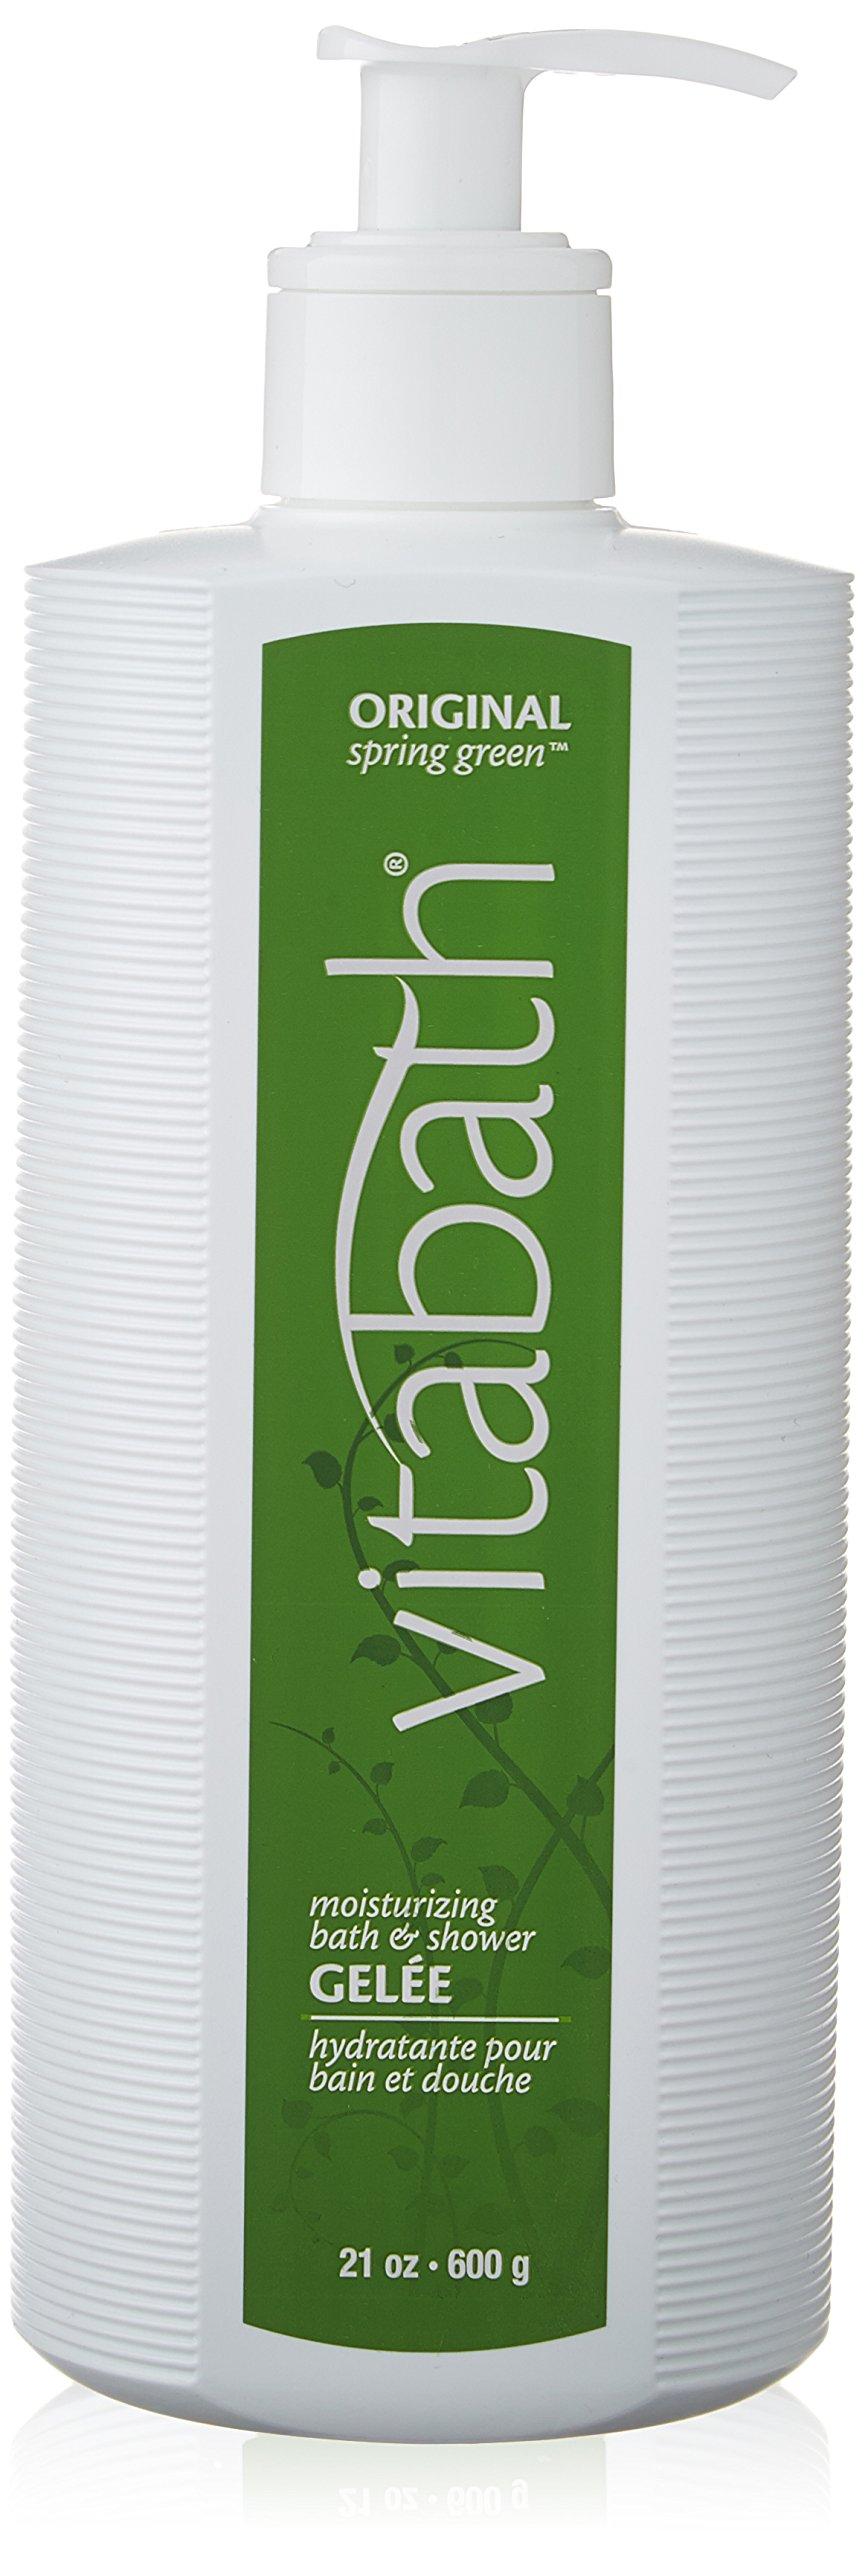 Amazon.com: Vitabath Bath & Shower Gelee, Moisturizing, Original ...